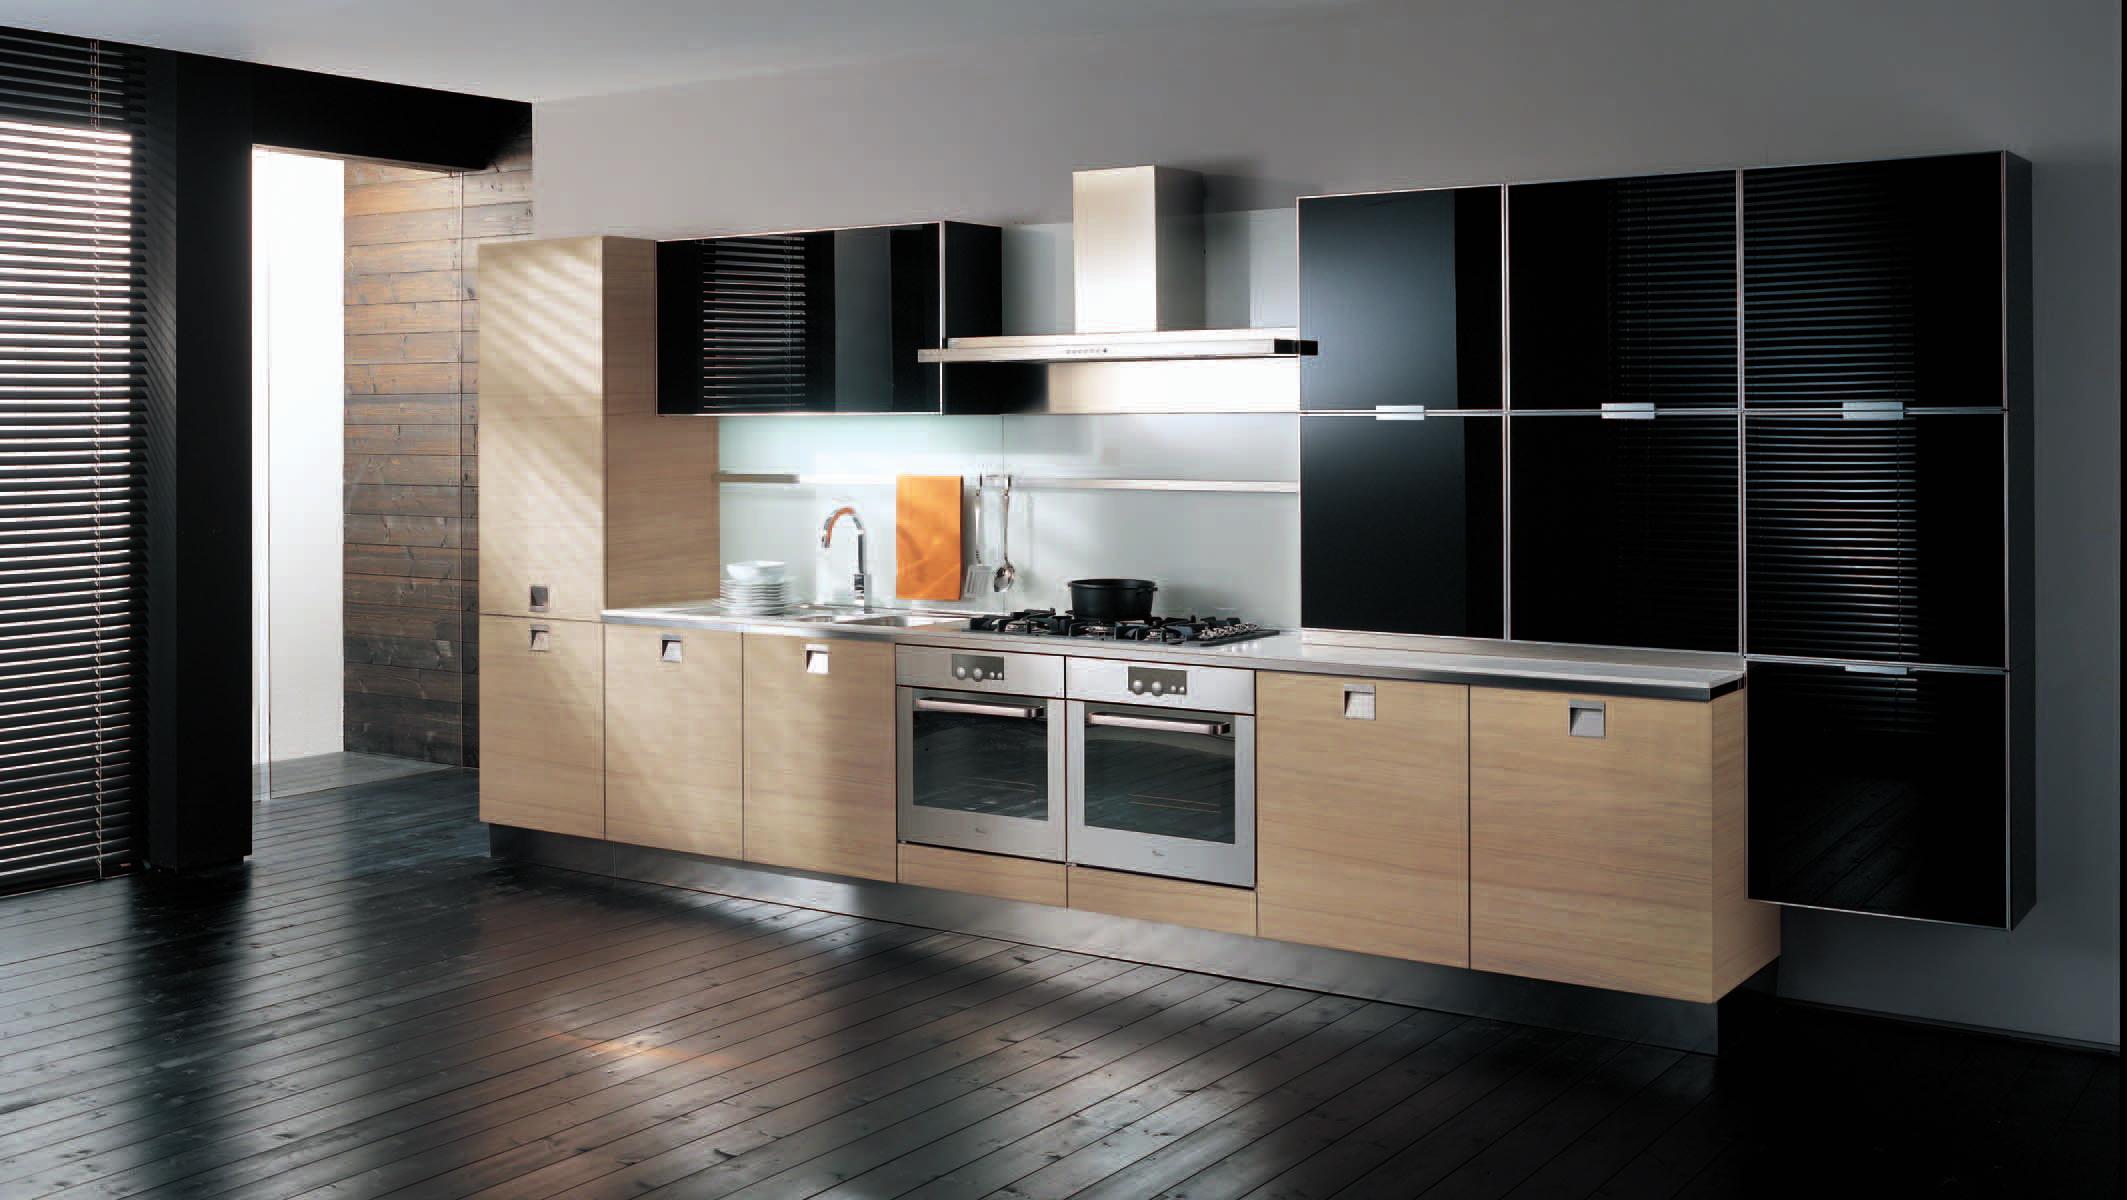 for Best interior design images